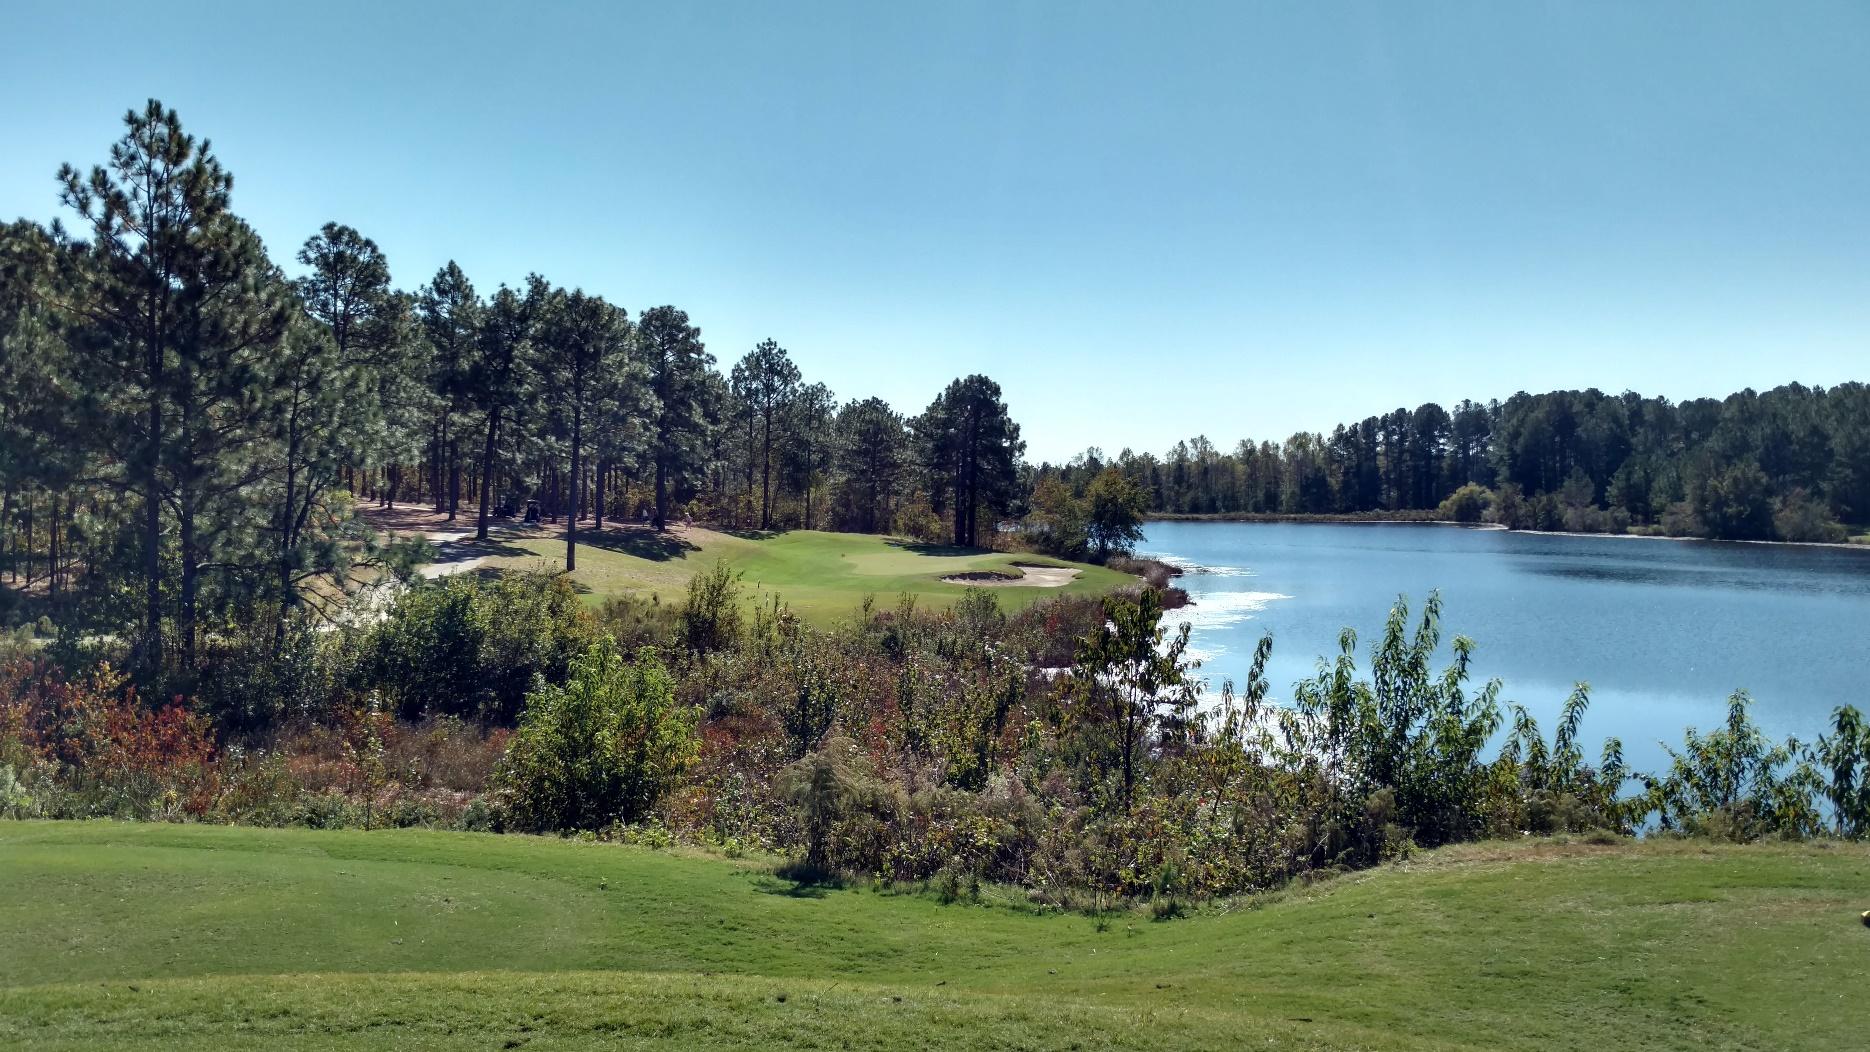 Legacy Golf Links (Aberdeen, NC on 10/23/16)